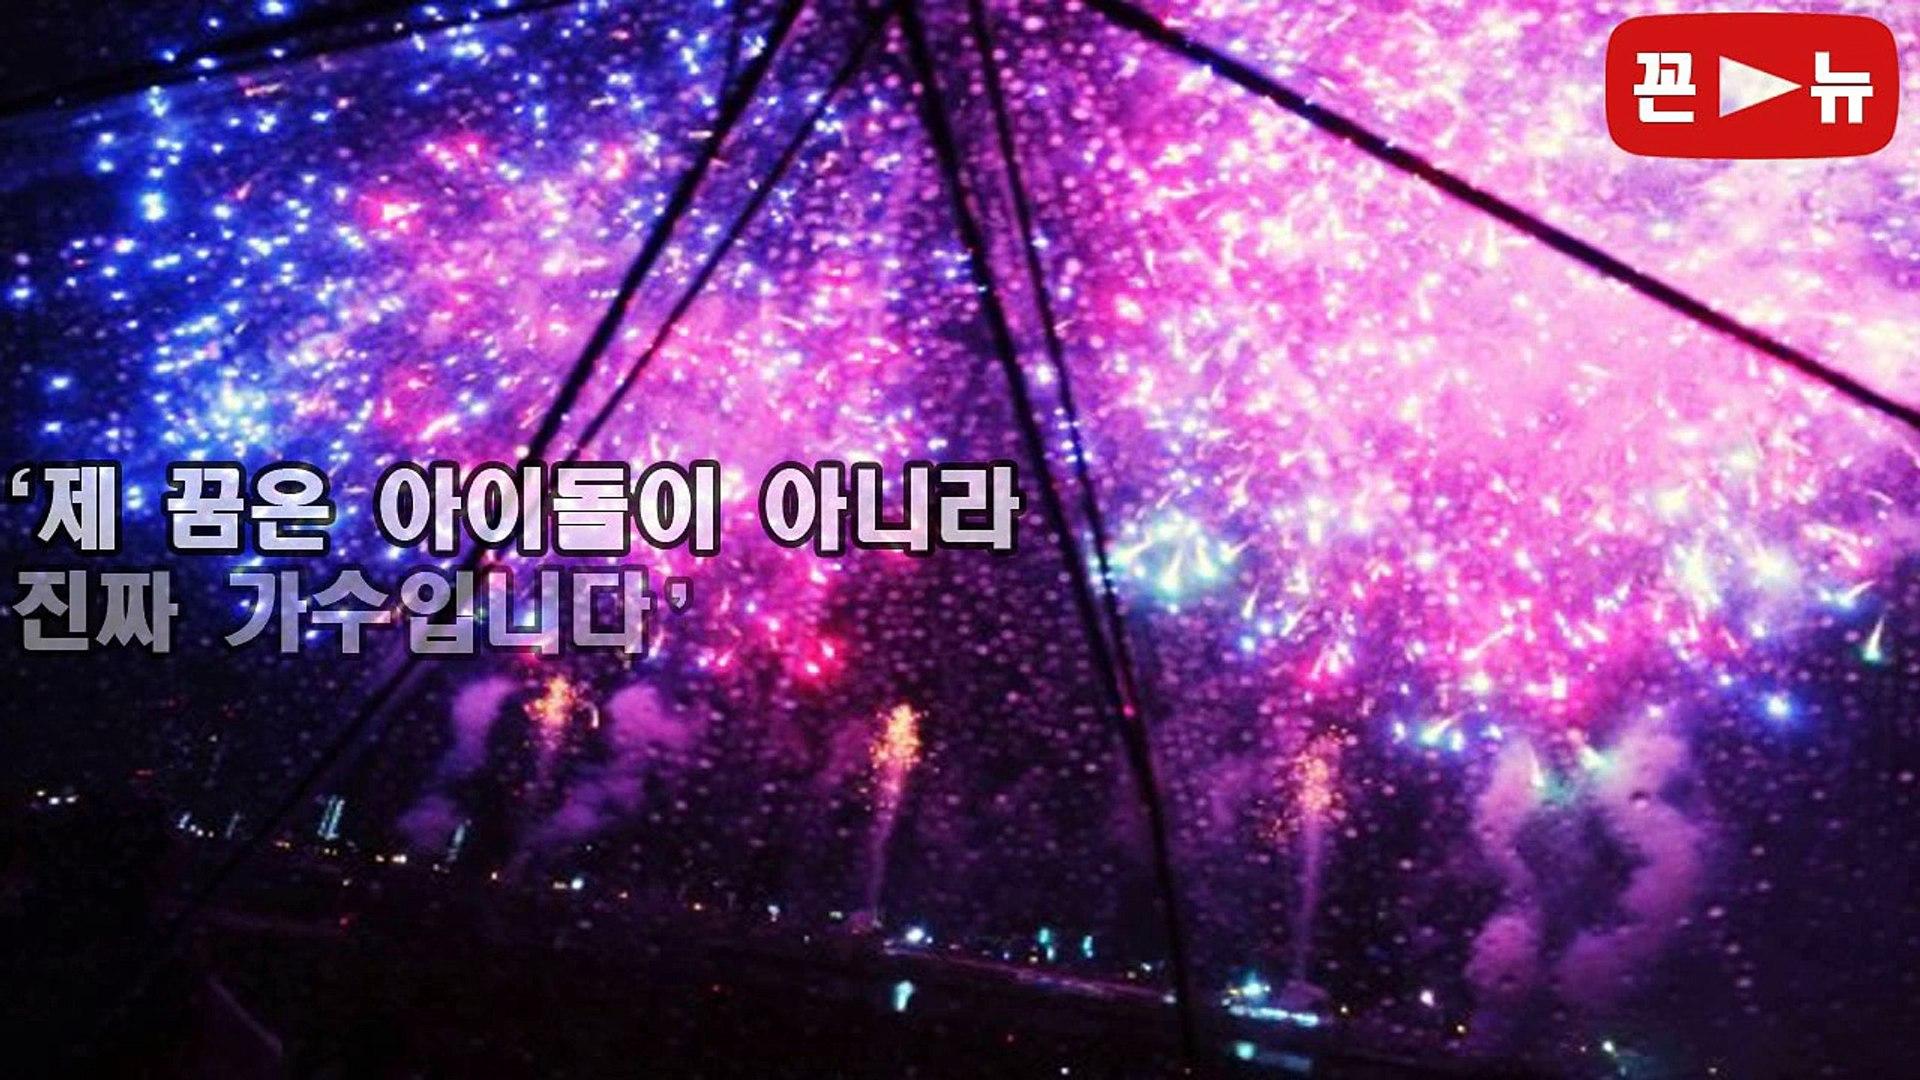 SM 이수만 사장을 매달리게 만든 여성 아이돌의 정체 k pop star korean idol celebrity Issue